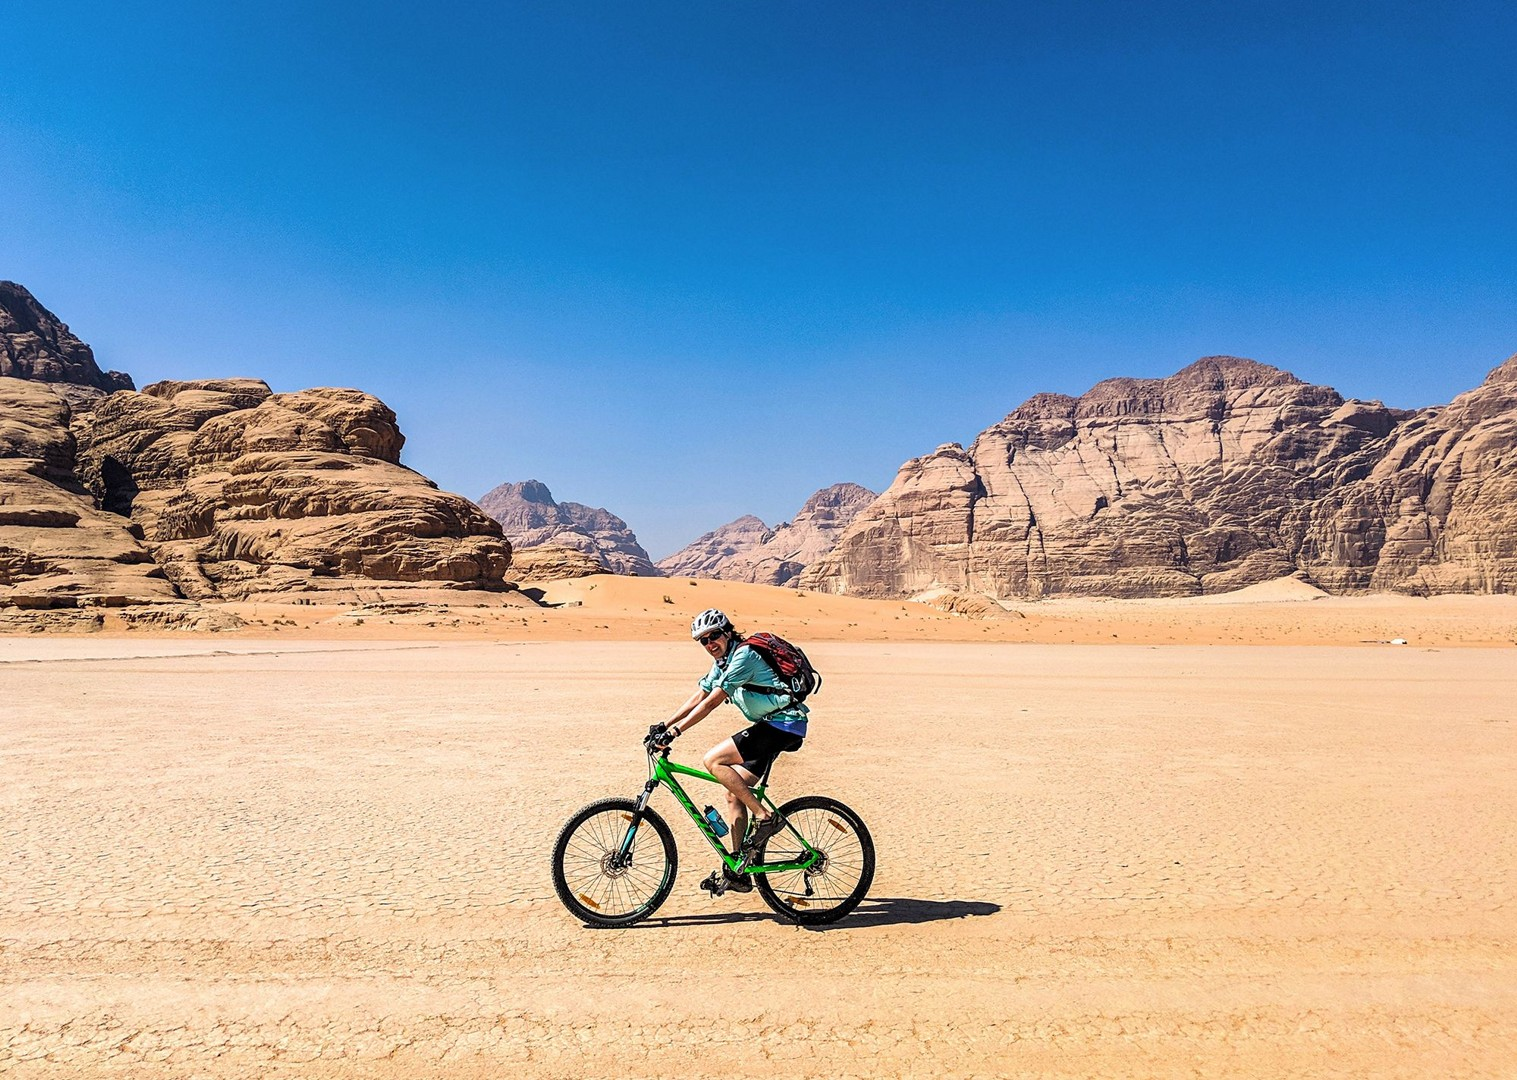 cycling-jordan-guided-adventures-holiday.jpg - NEW! Jordan - Petra, Wadi Rum & the Dead Sea - Cycling Adventures